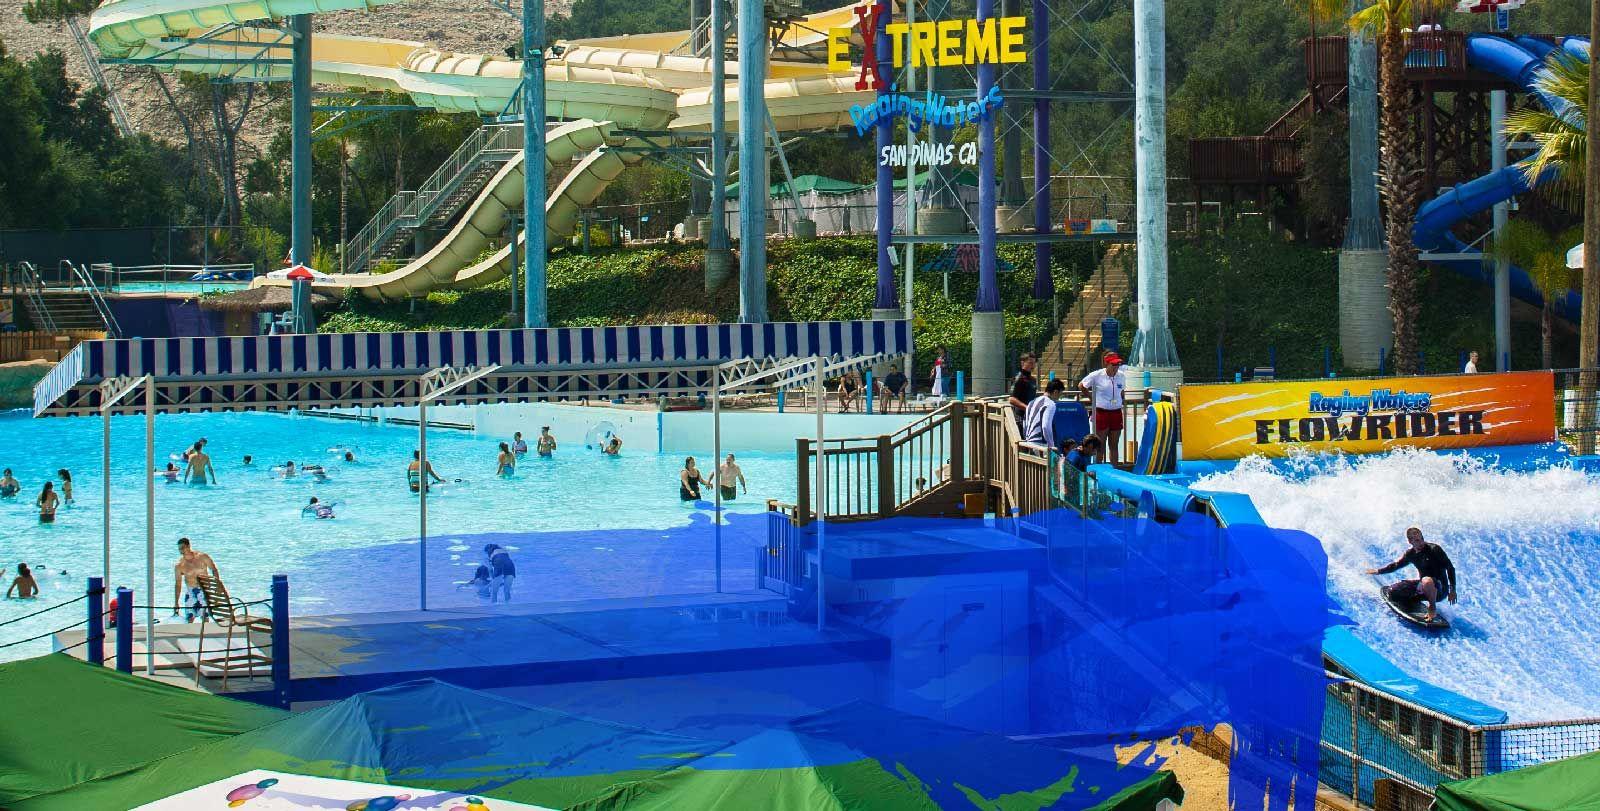 Raging Waters San Dimas Water Park Rides Water Park San Dimas